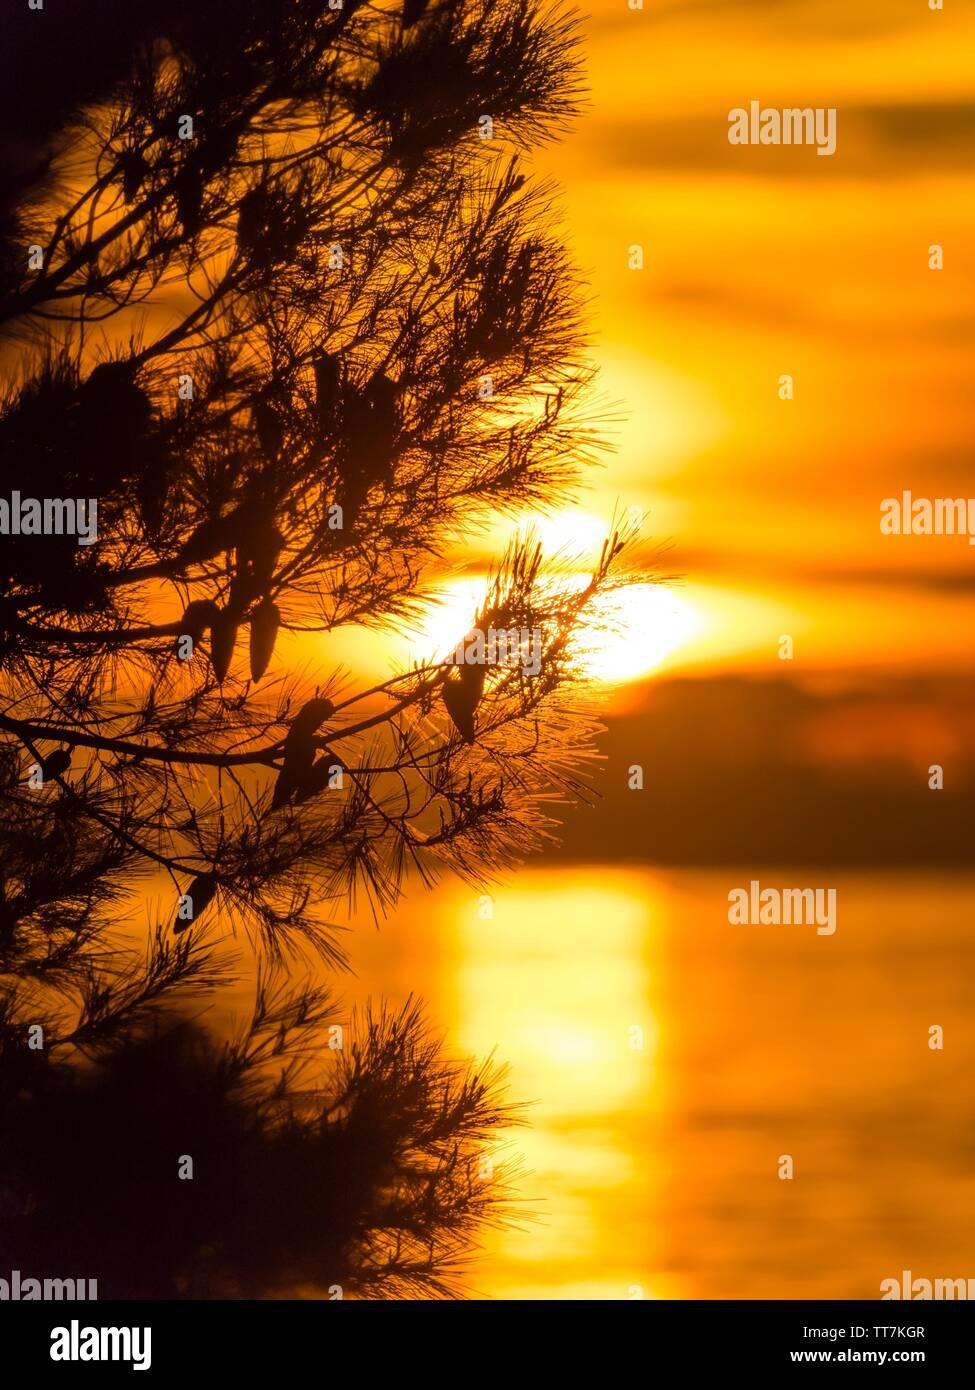 Sunset tree against setting sunset sun unsharp blurred low above sea horizon Stock Photo